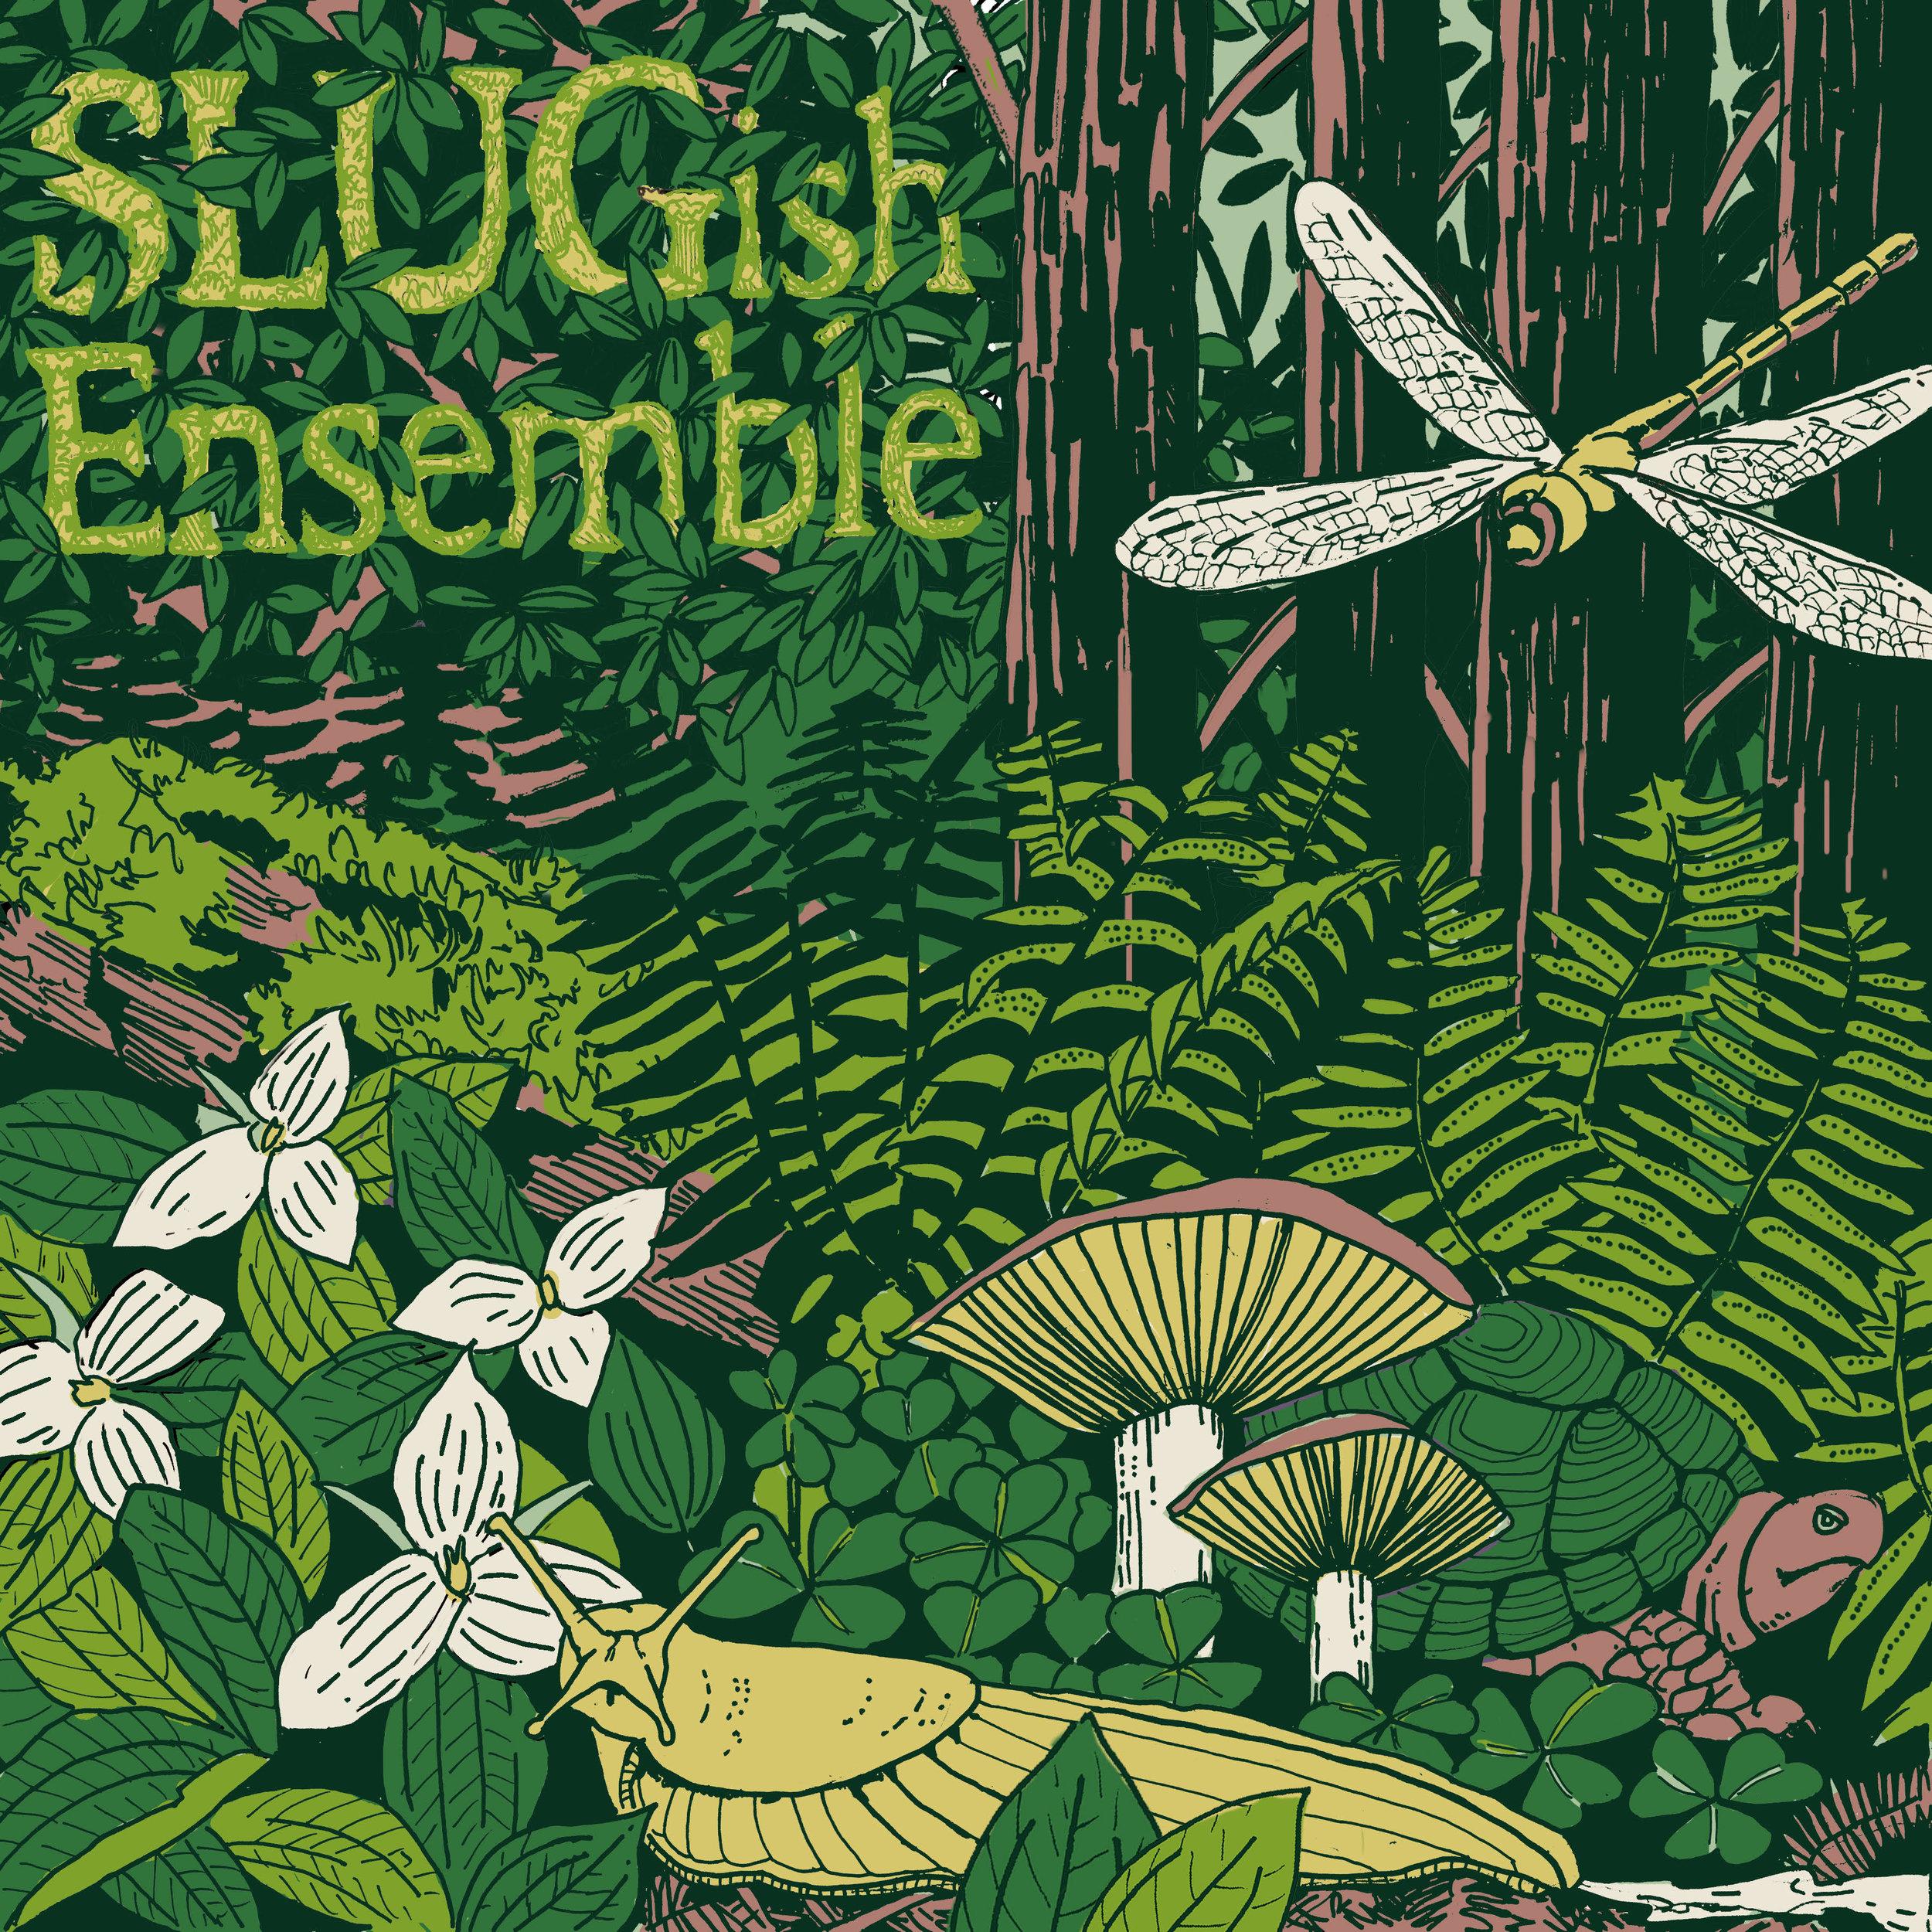 SLUGish_Ensemble_8:9_artwork_final.jpg